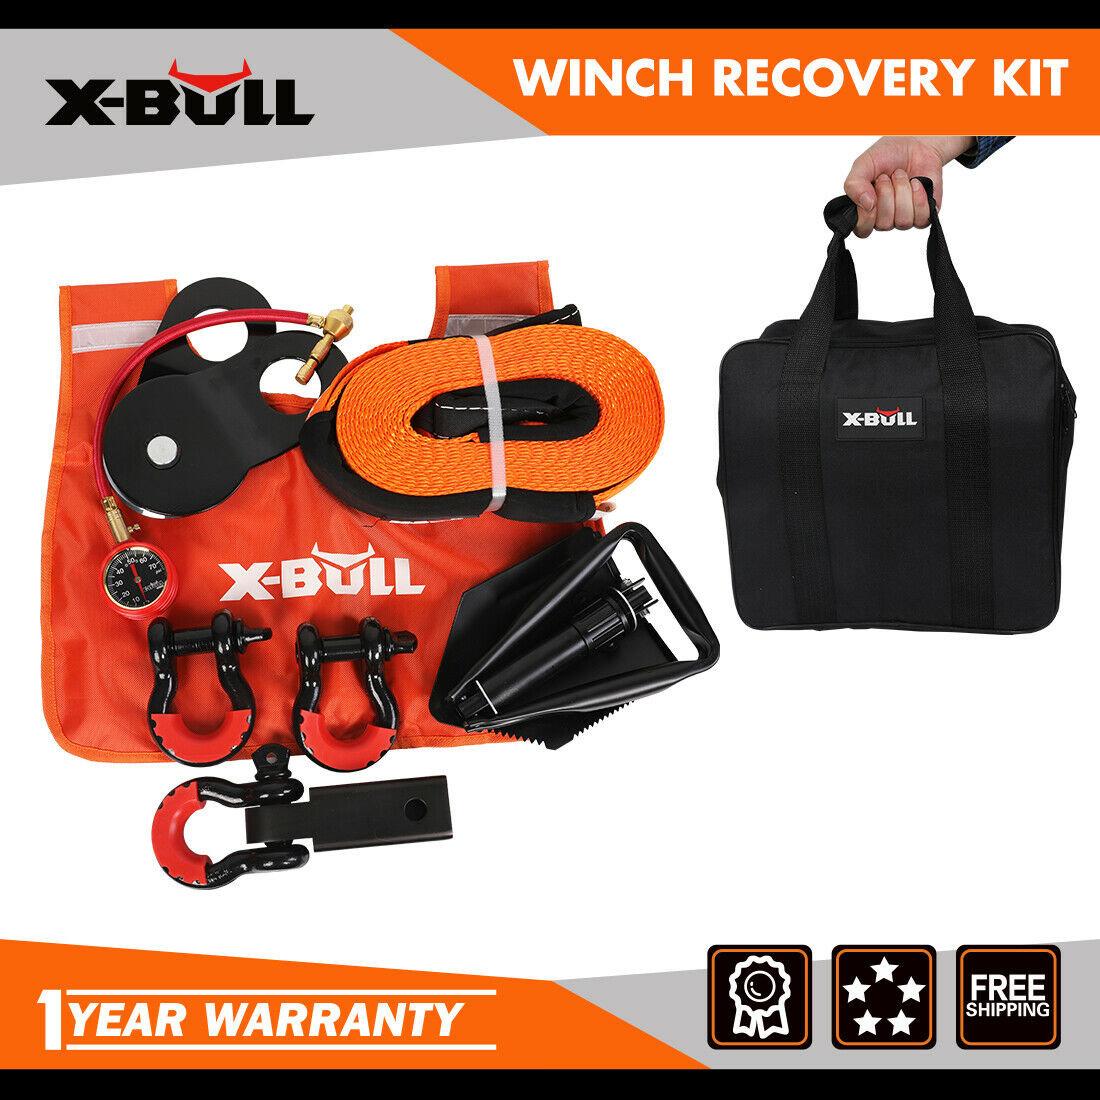 x-bull-winch-recover-kit.jpg